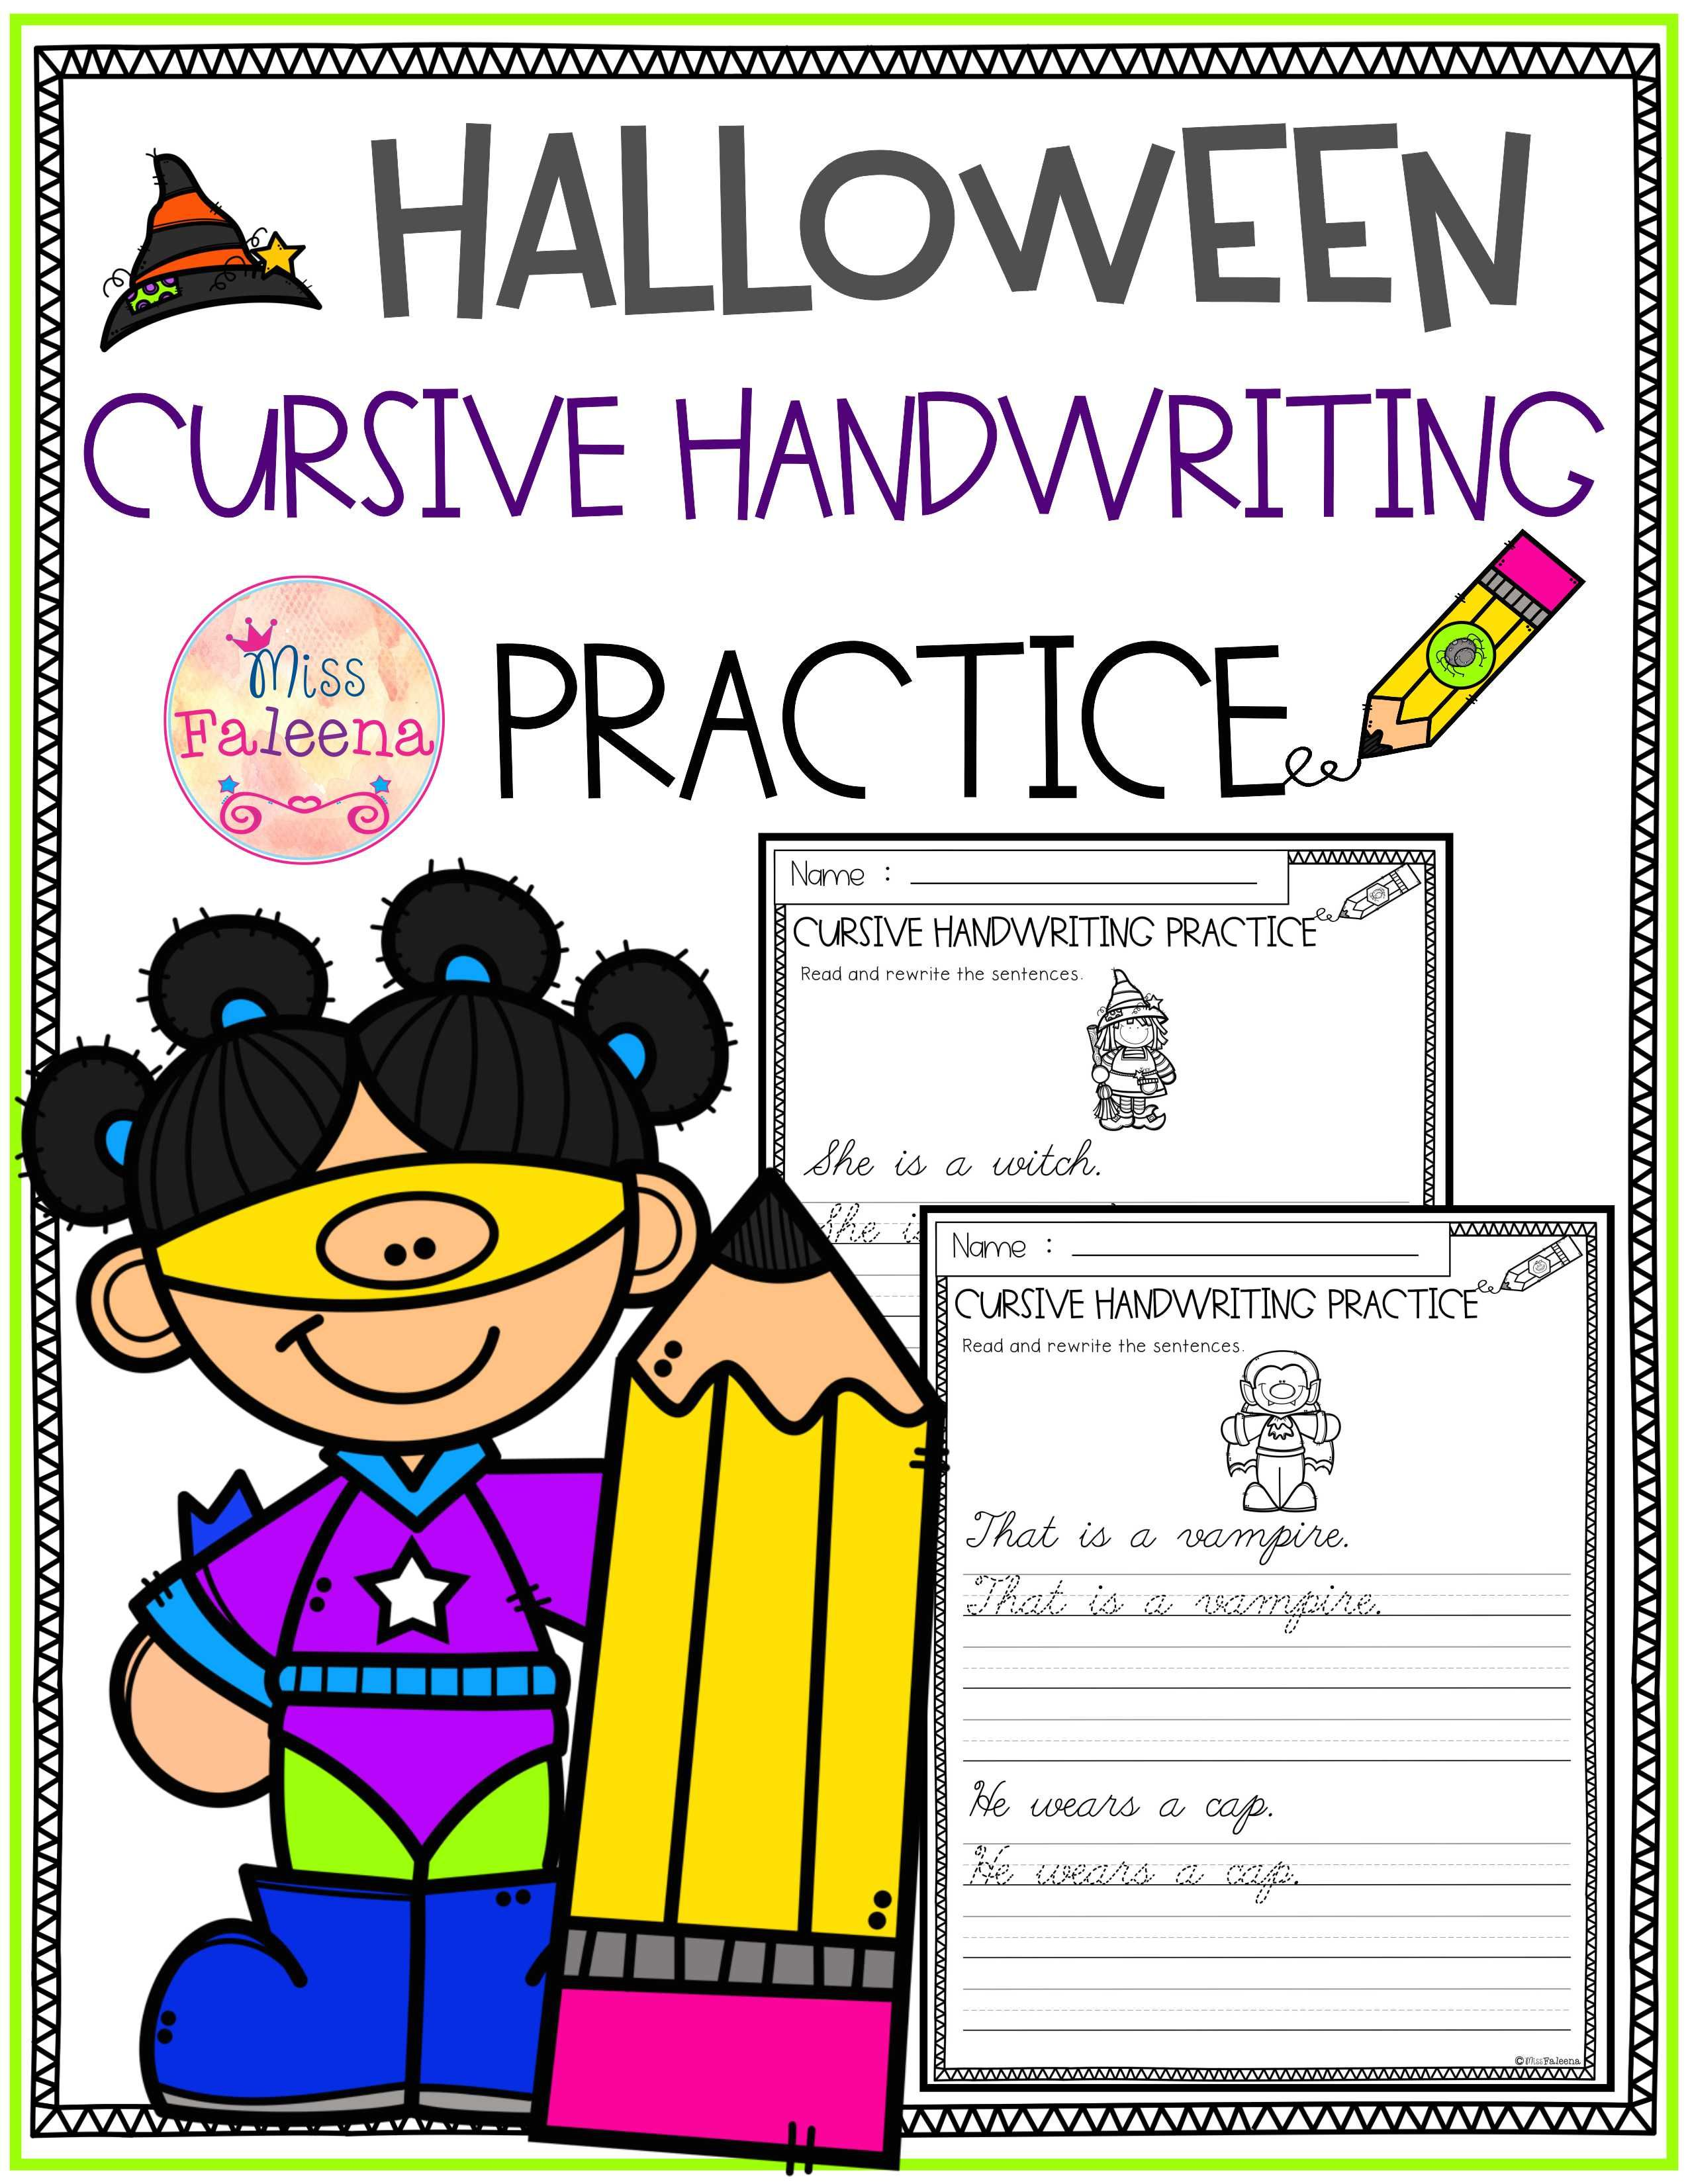 Halloween Cursive Handwriting This Product Has 20 Pages Of Handwriting Worksheets This Pro Cursive Handwriting Practice Handwriting Practice Reading Writing [ 3300 x 2550 Pixel ]